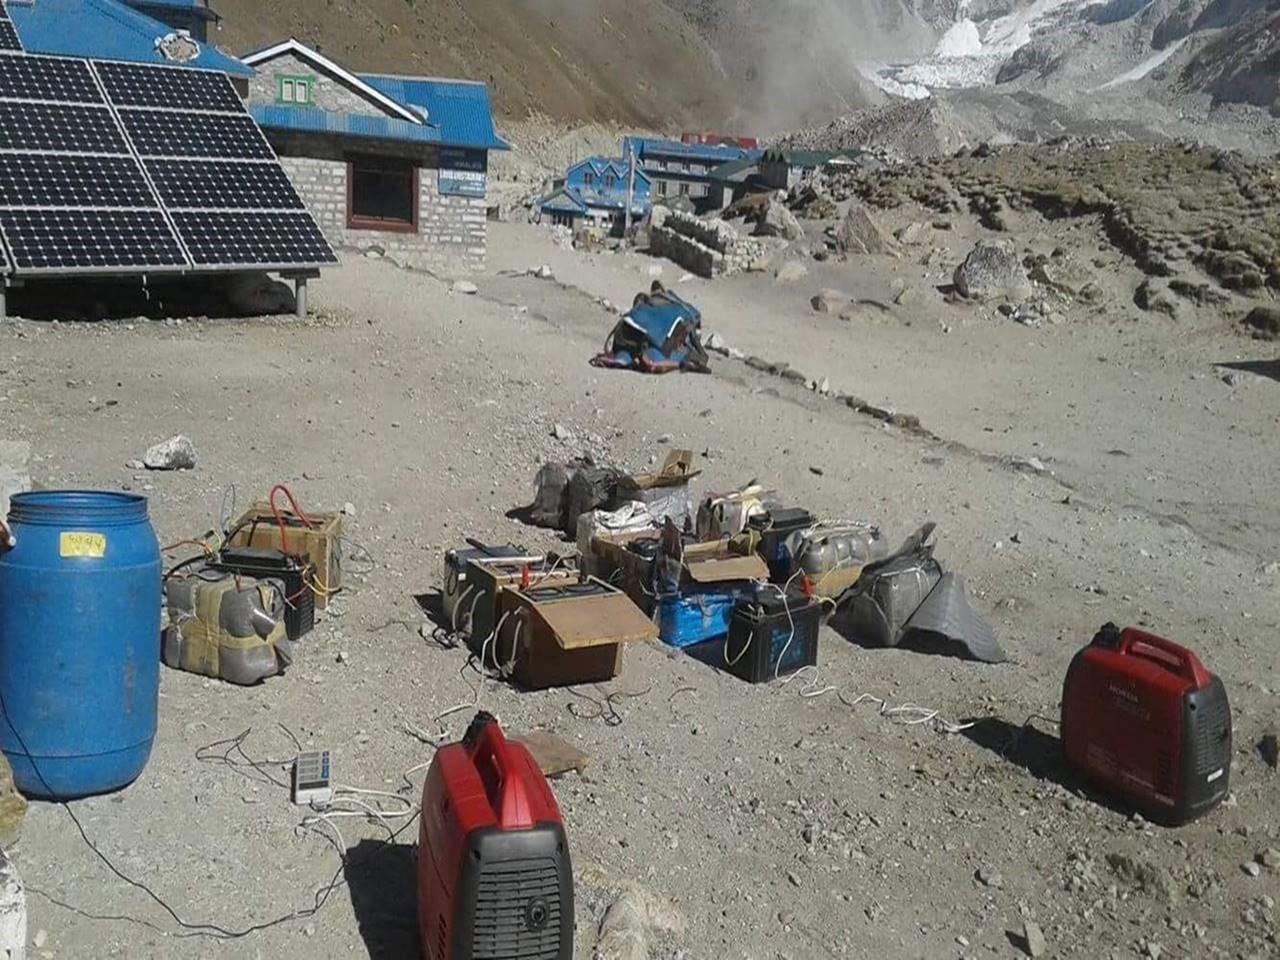 Charging the IMG Everest batteries at Gorak Shep, November 2016.